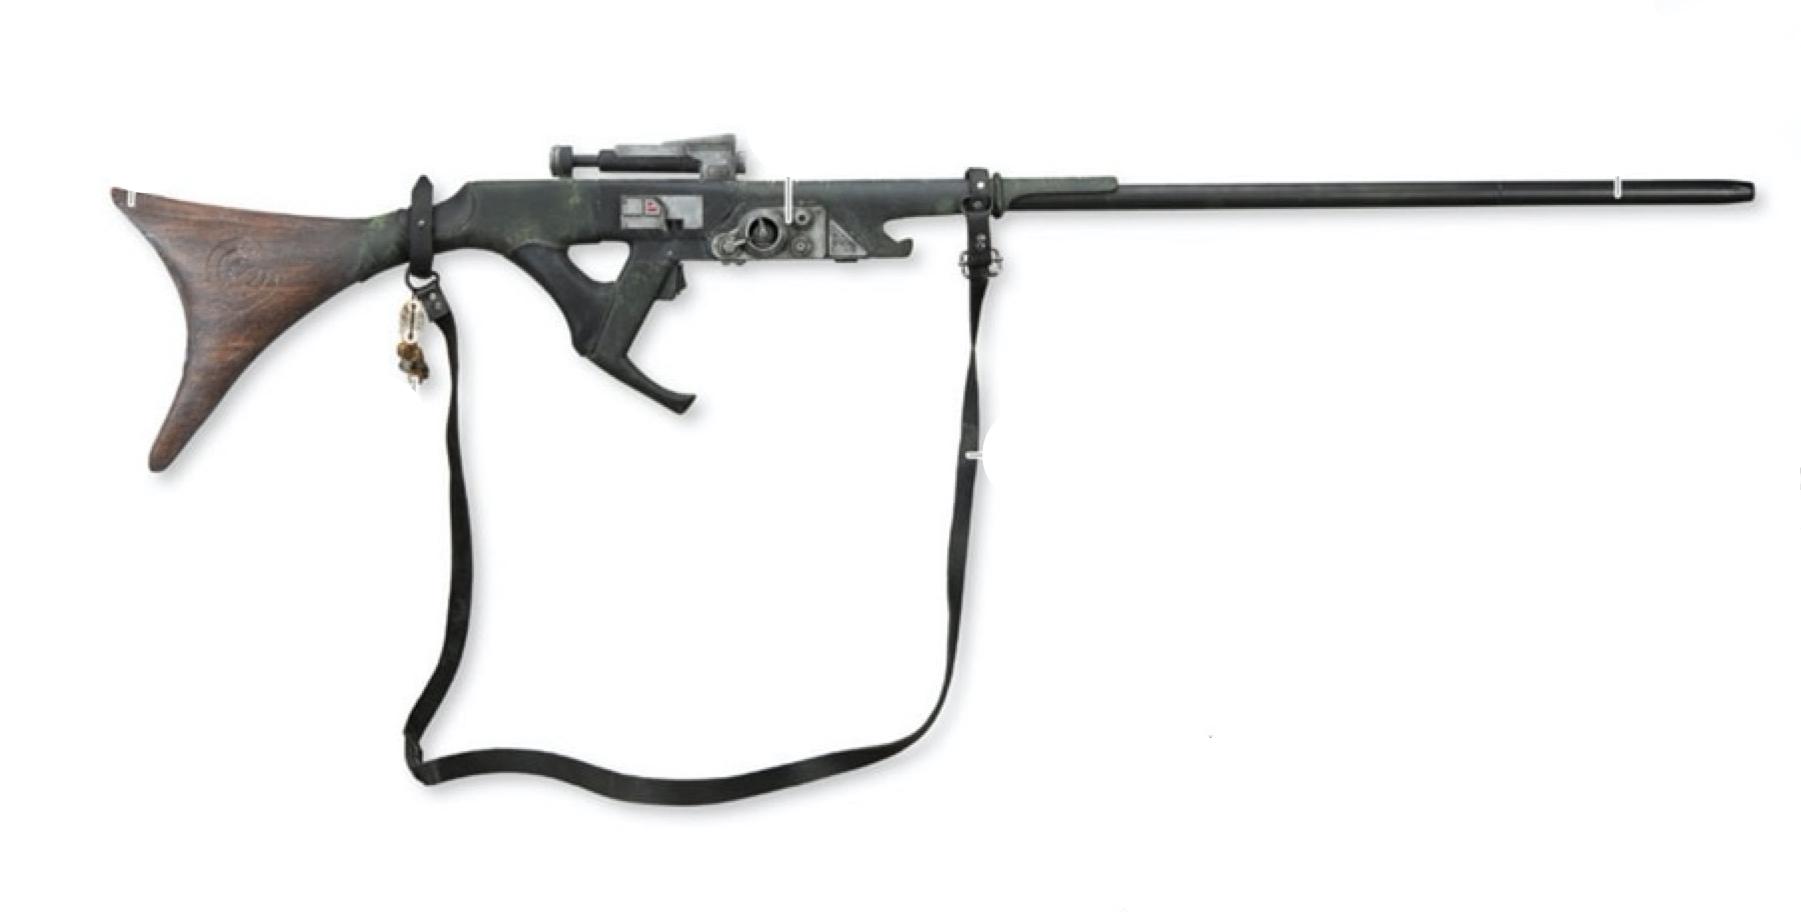 IQA-15 Sniper Rifle